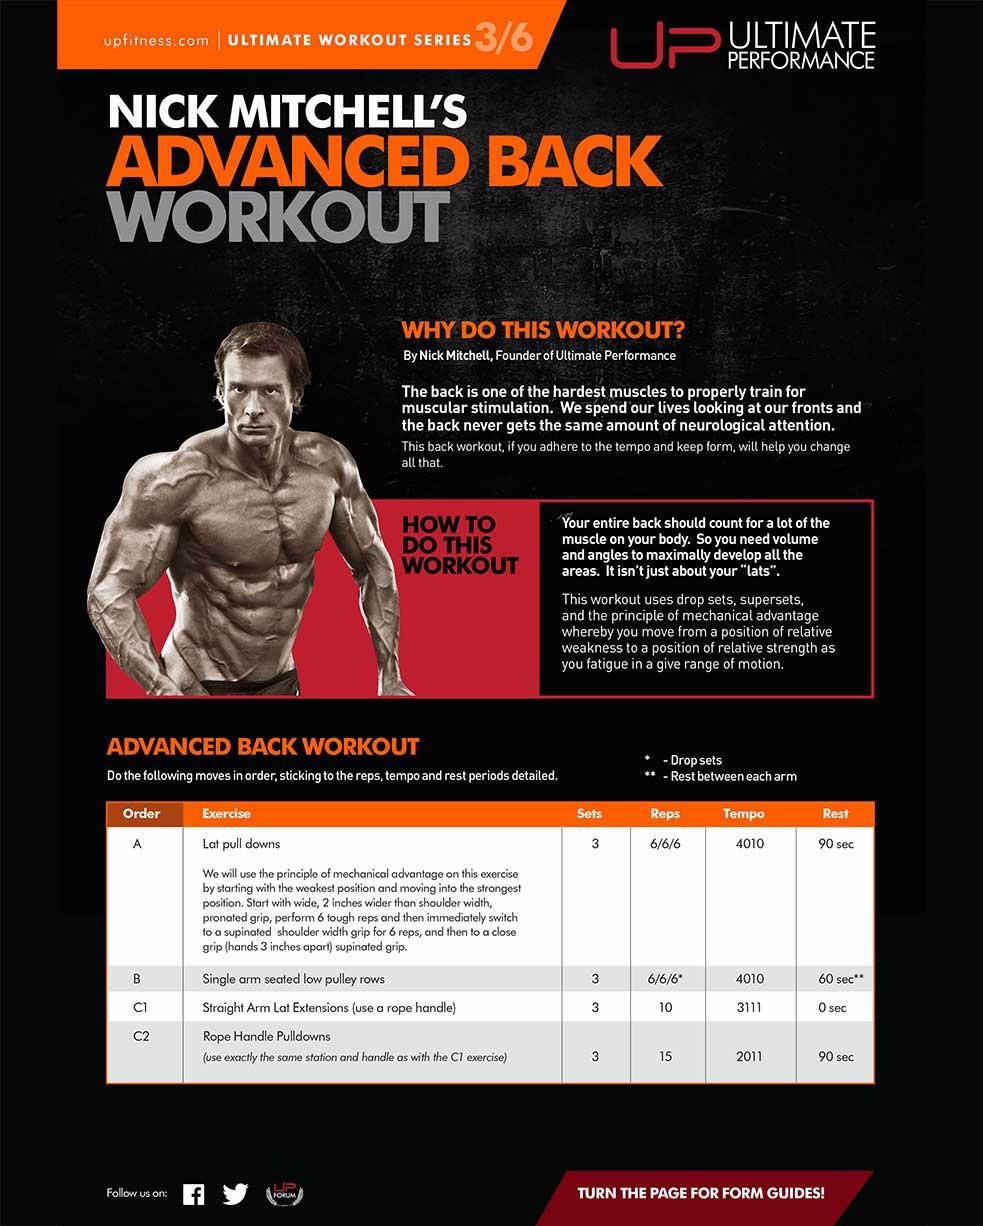 Advanced Back Workout